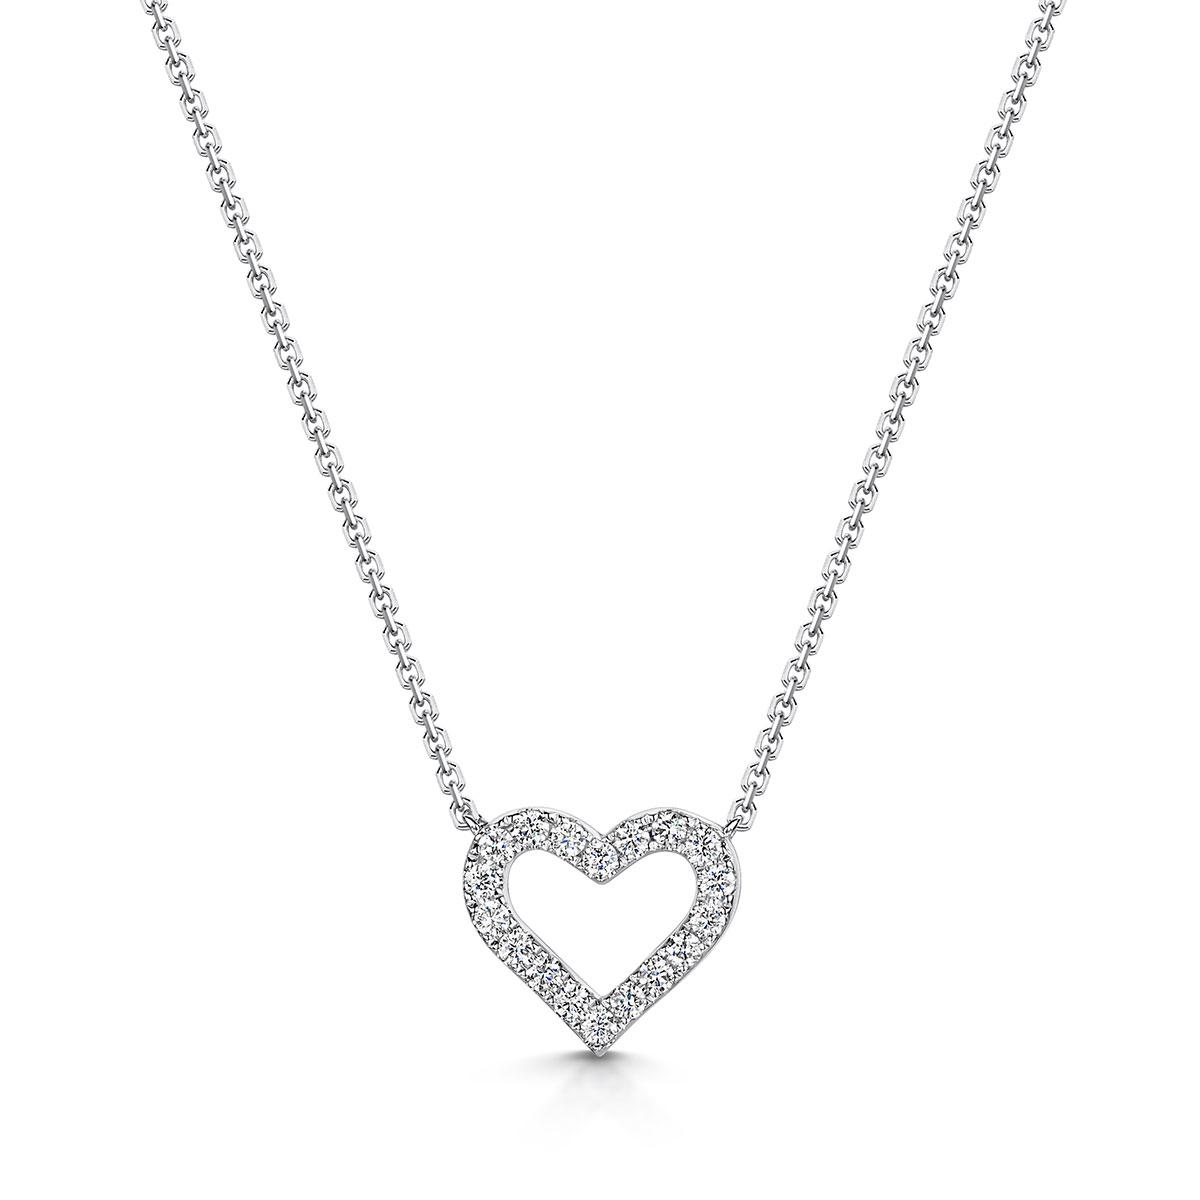 ROX Heart Diamond Necklace 0.21cts